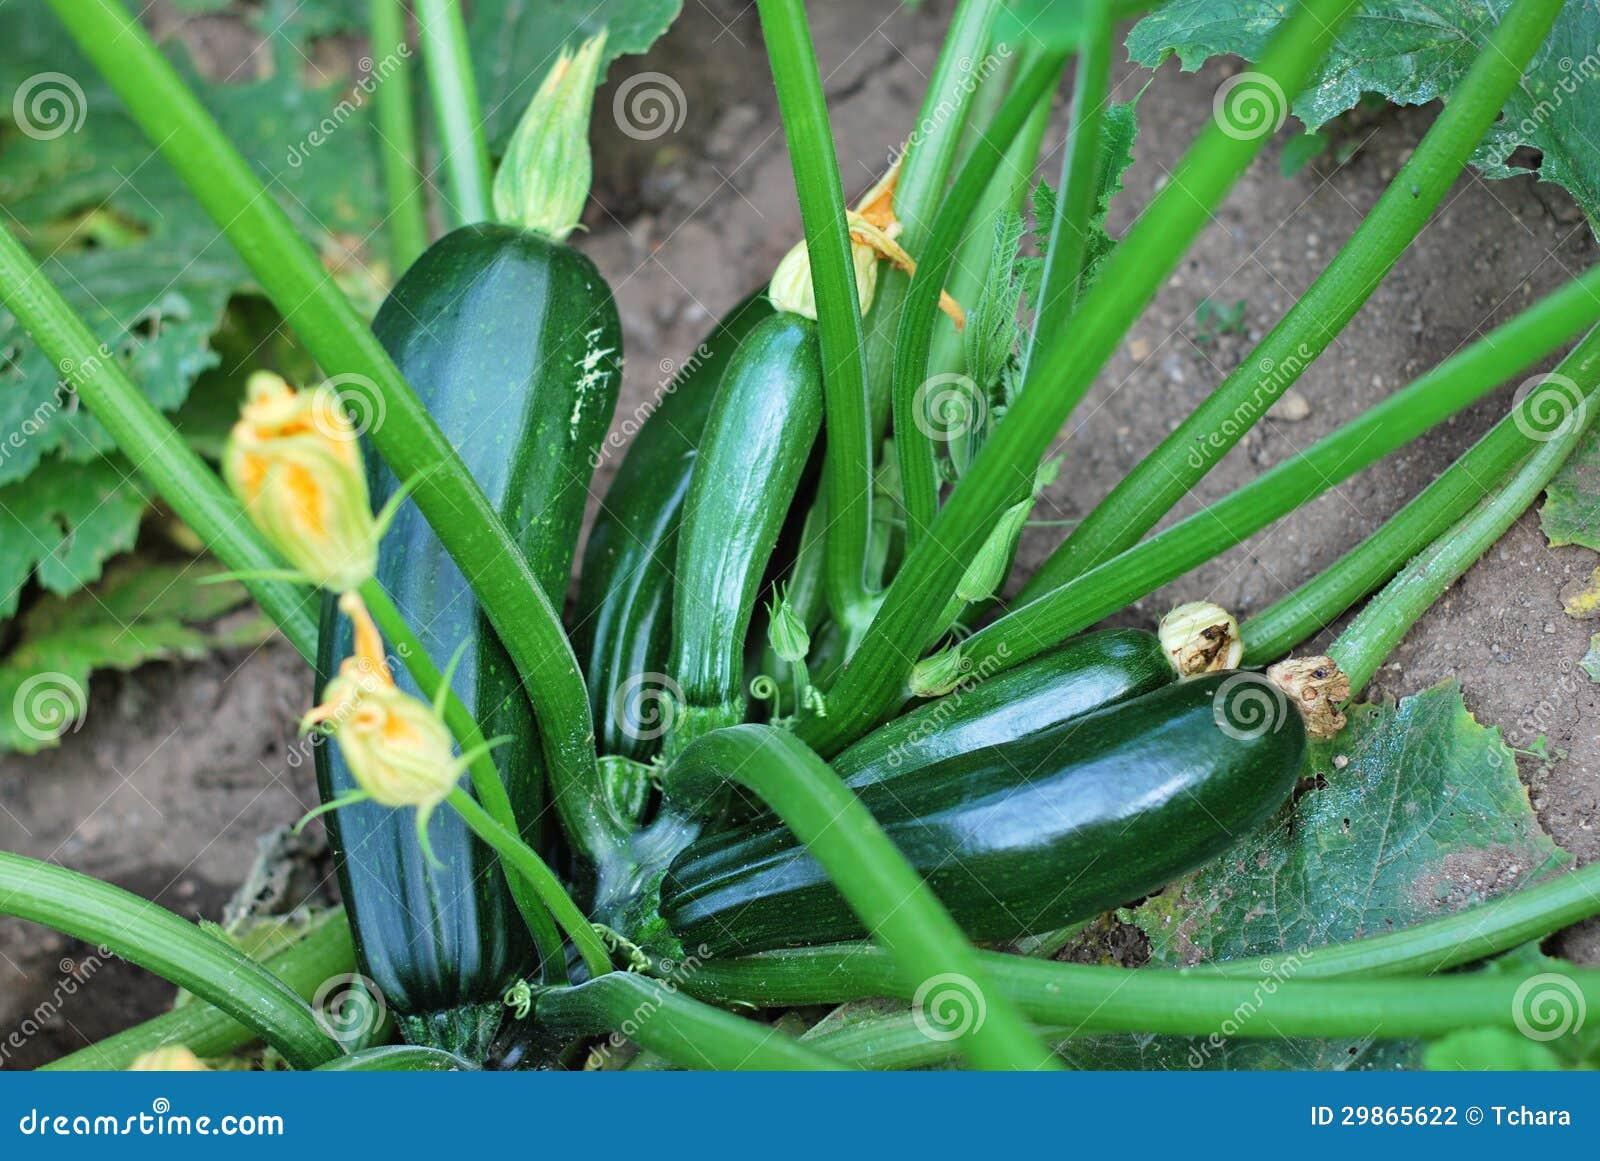 Zucchini Plant Stock Photography - Image: 29865622 Zucchini Plant Images